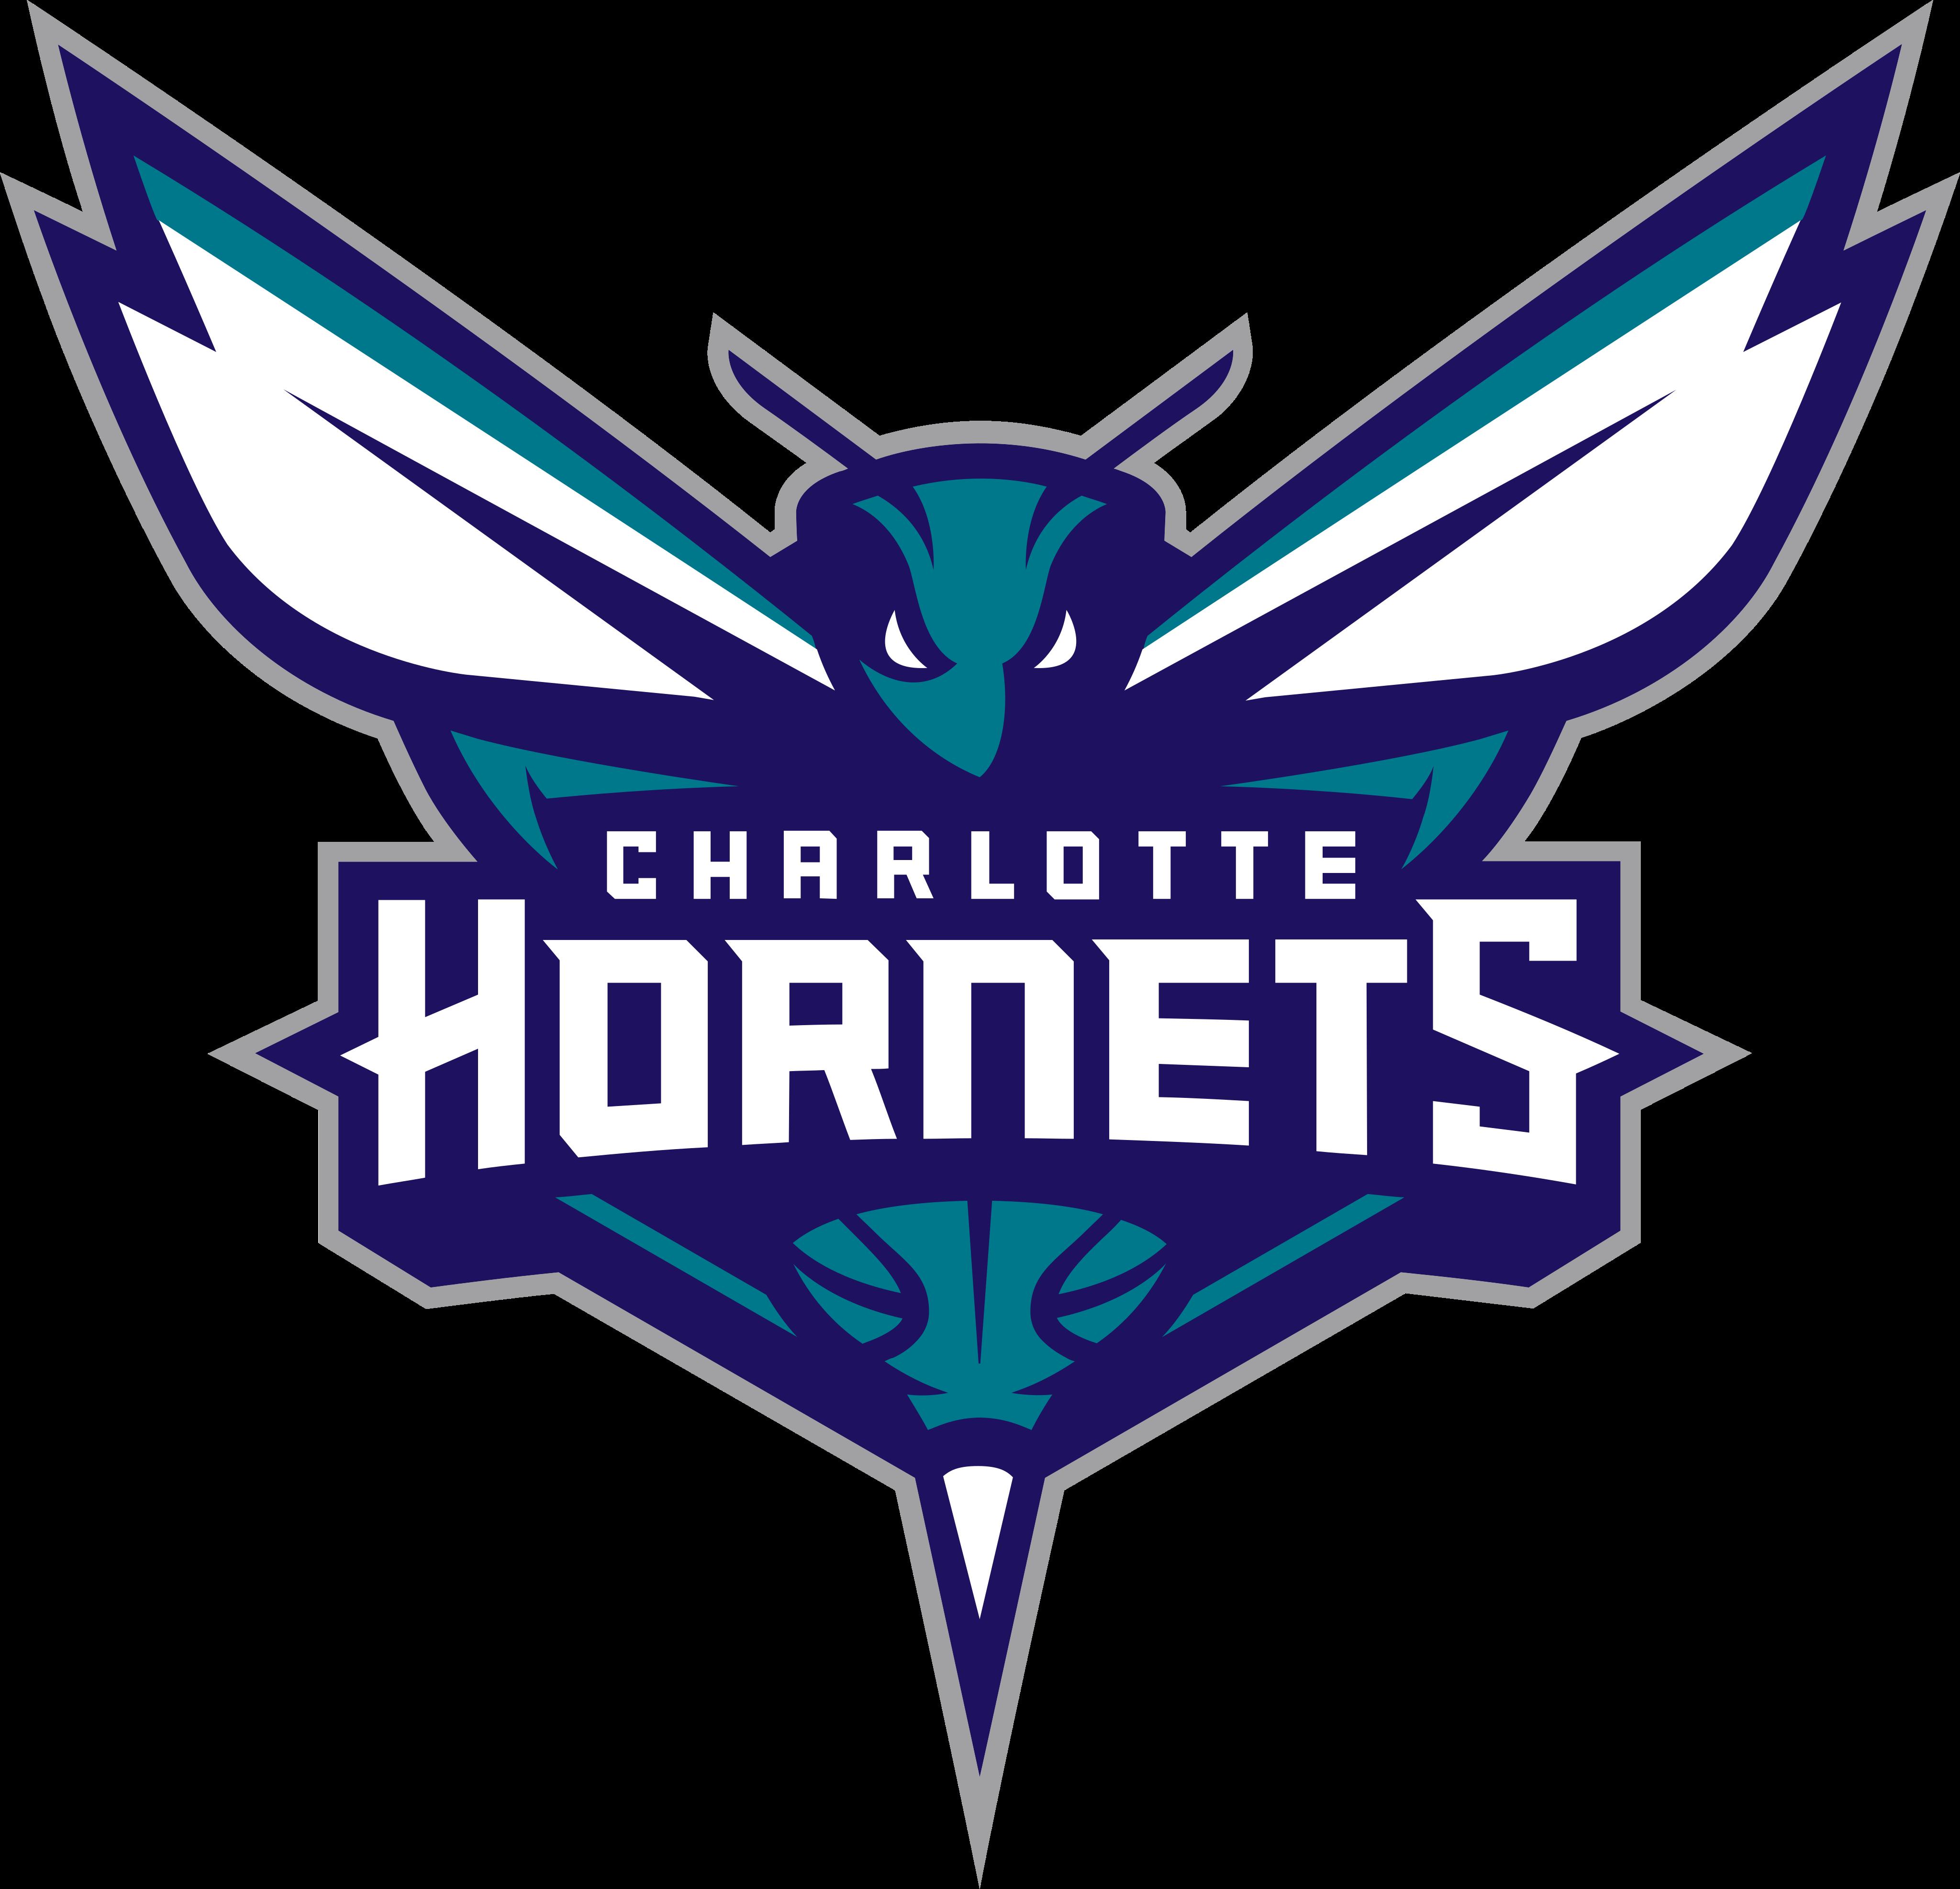 charlotte hornets logo - Charlotte Hornets Logo